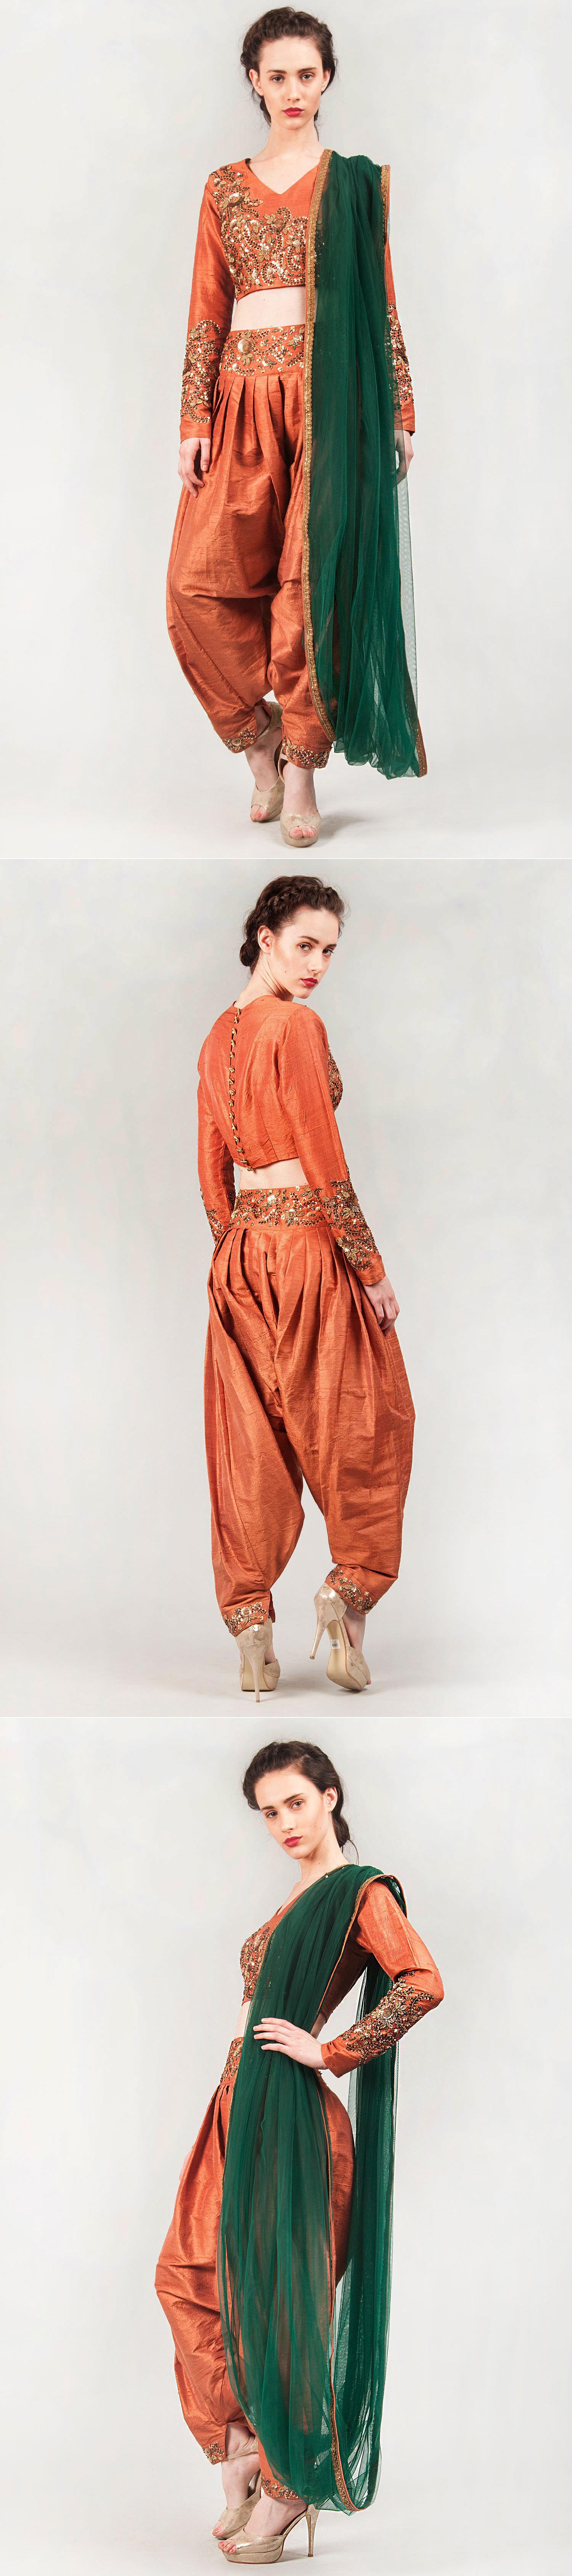 RIANTA'S Heavy embroidered drape dhoti set